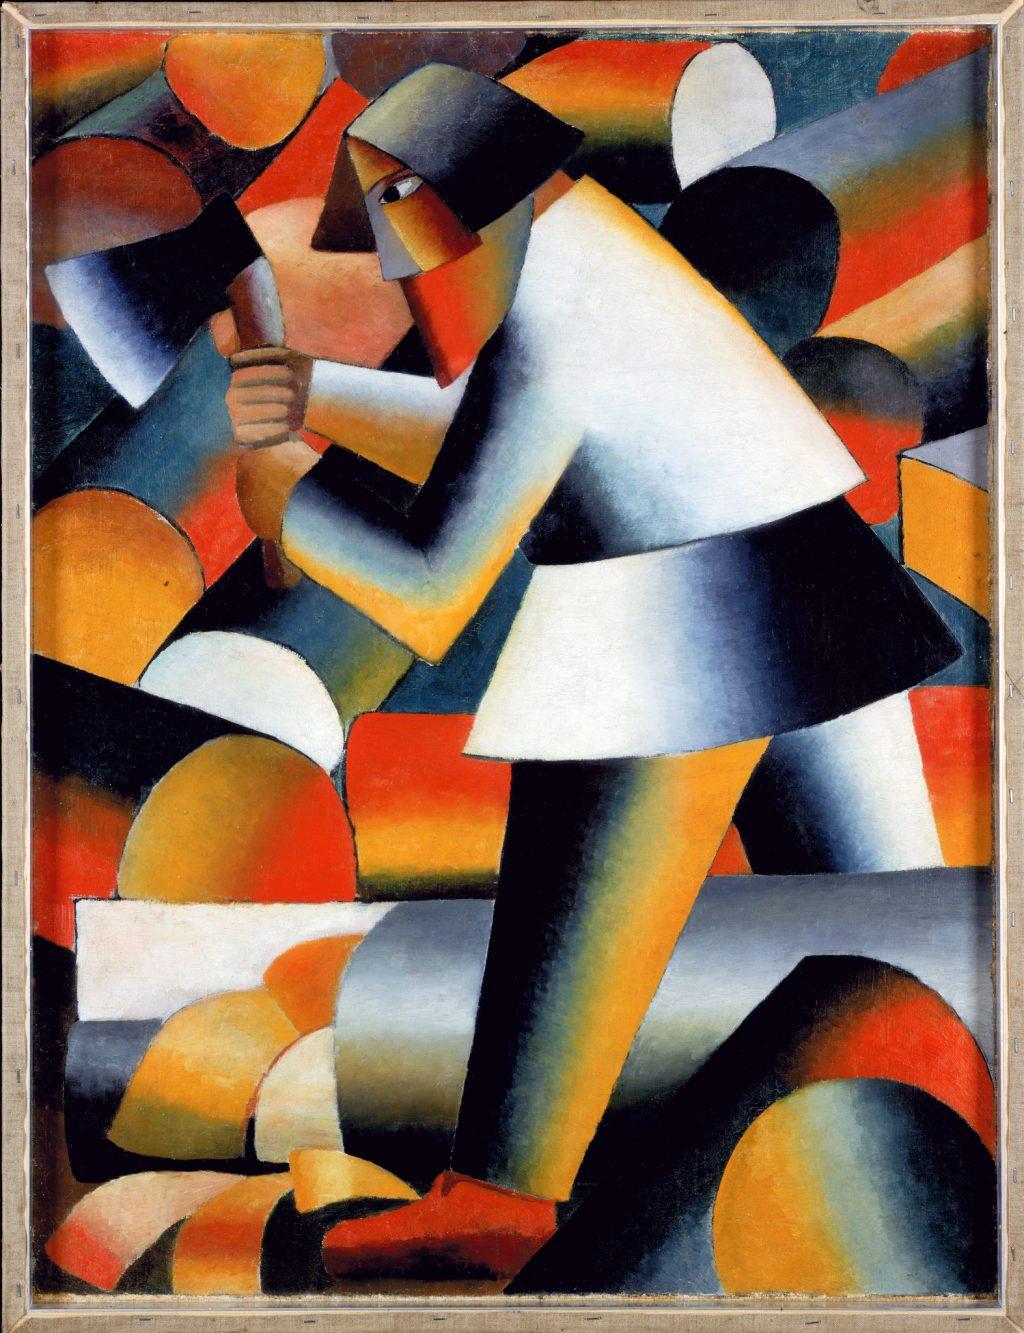 Kazimir Malevich Der Holzfäller 1912-3